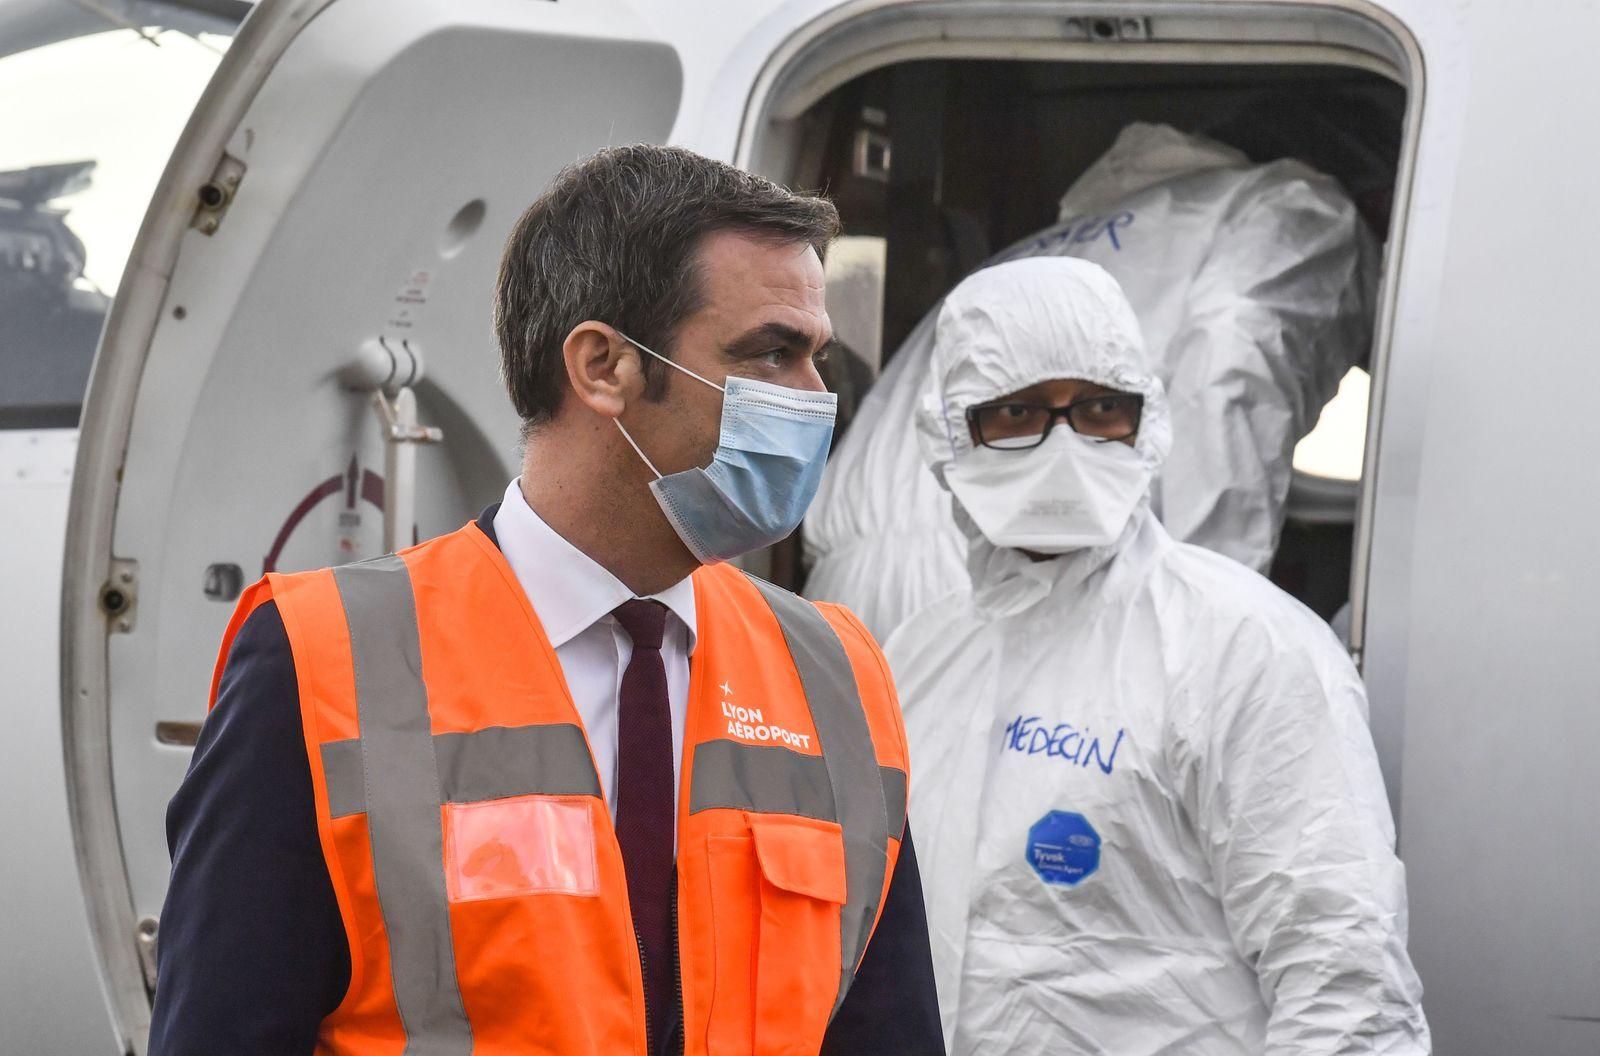 FRANCE-GOVERNMENT-HEALTH-VIRUS-EVACUATION